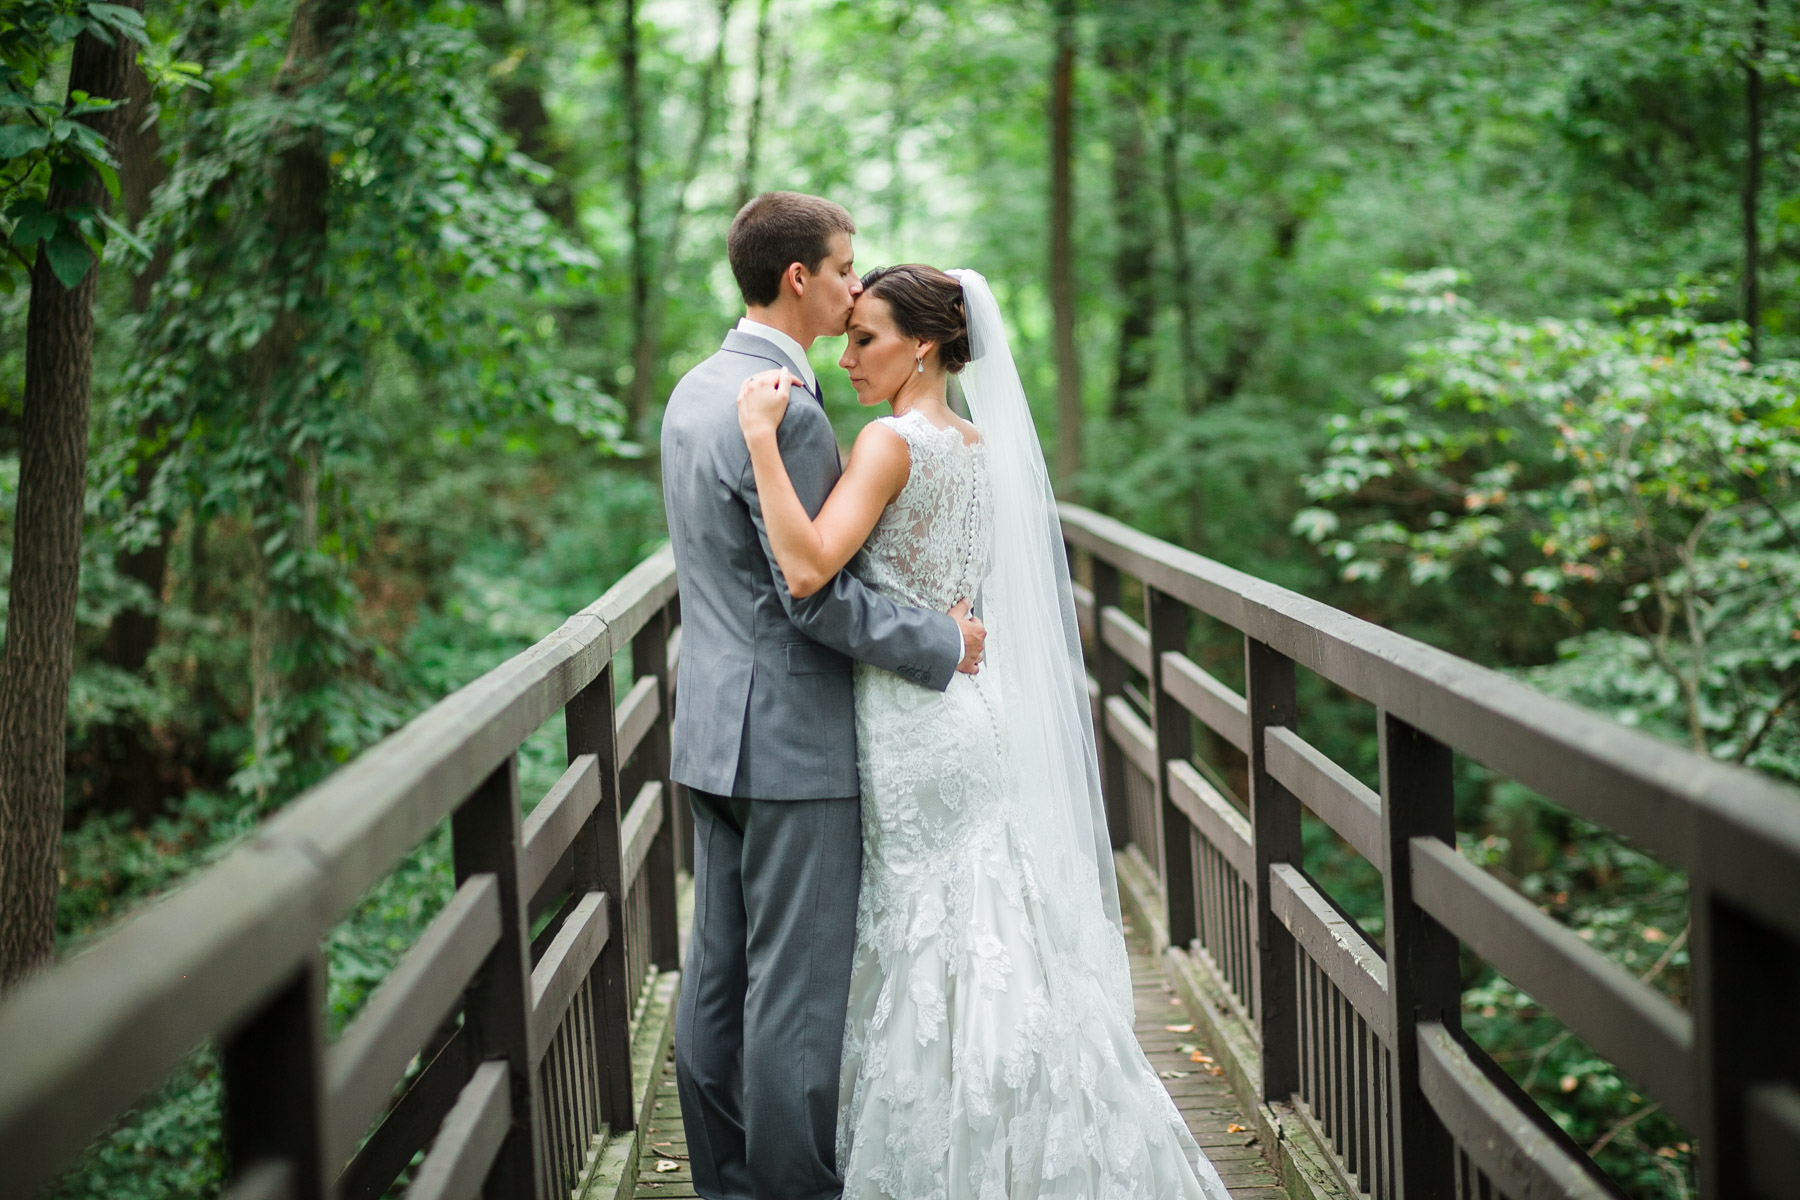 wildwood-park-wedding-photos-60.jpg